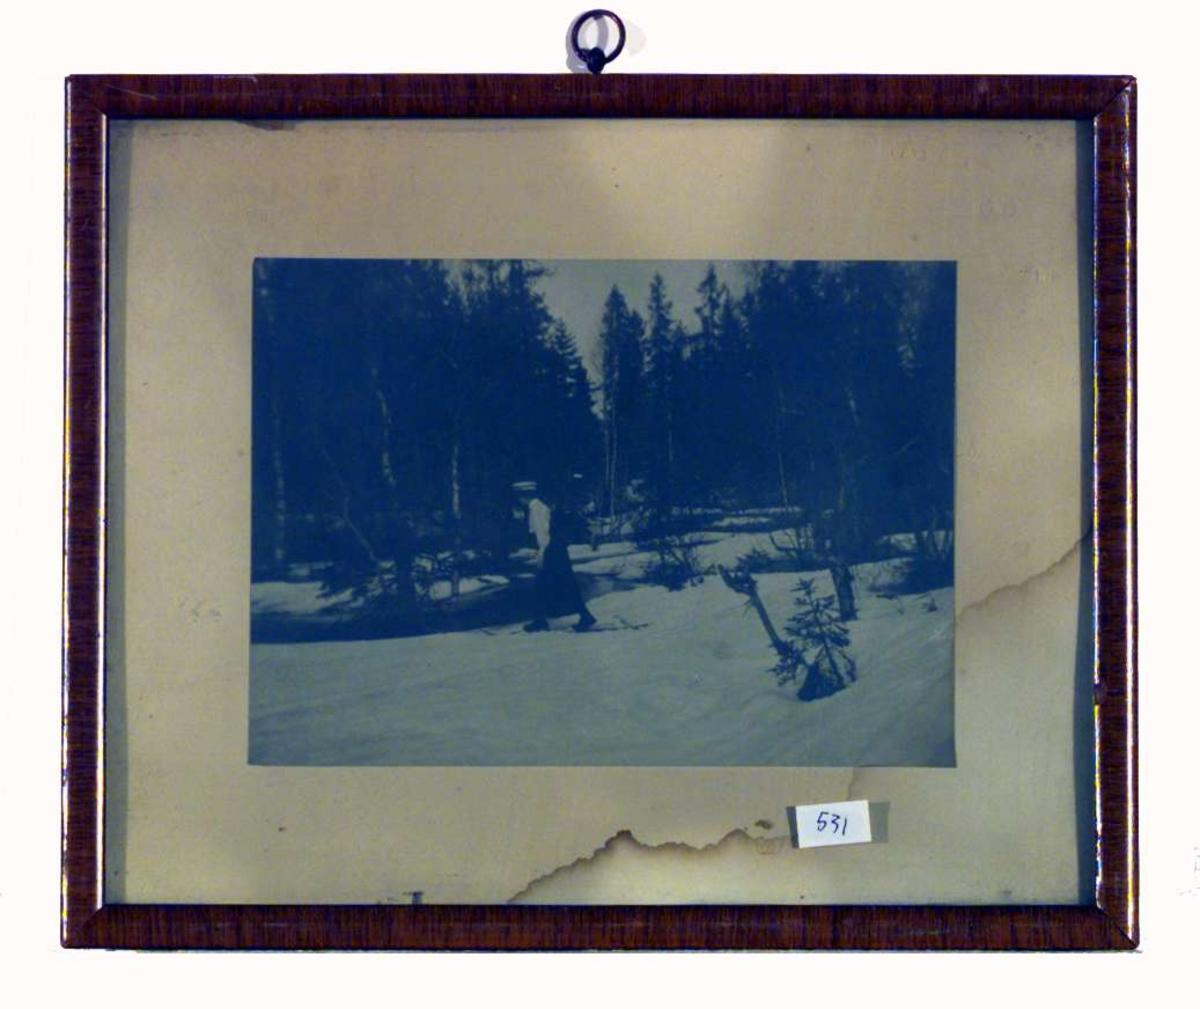 Bildet viser Sigrid Undset på skitur i Nordmarka, sannsynligvis våren 1907.